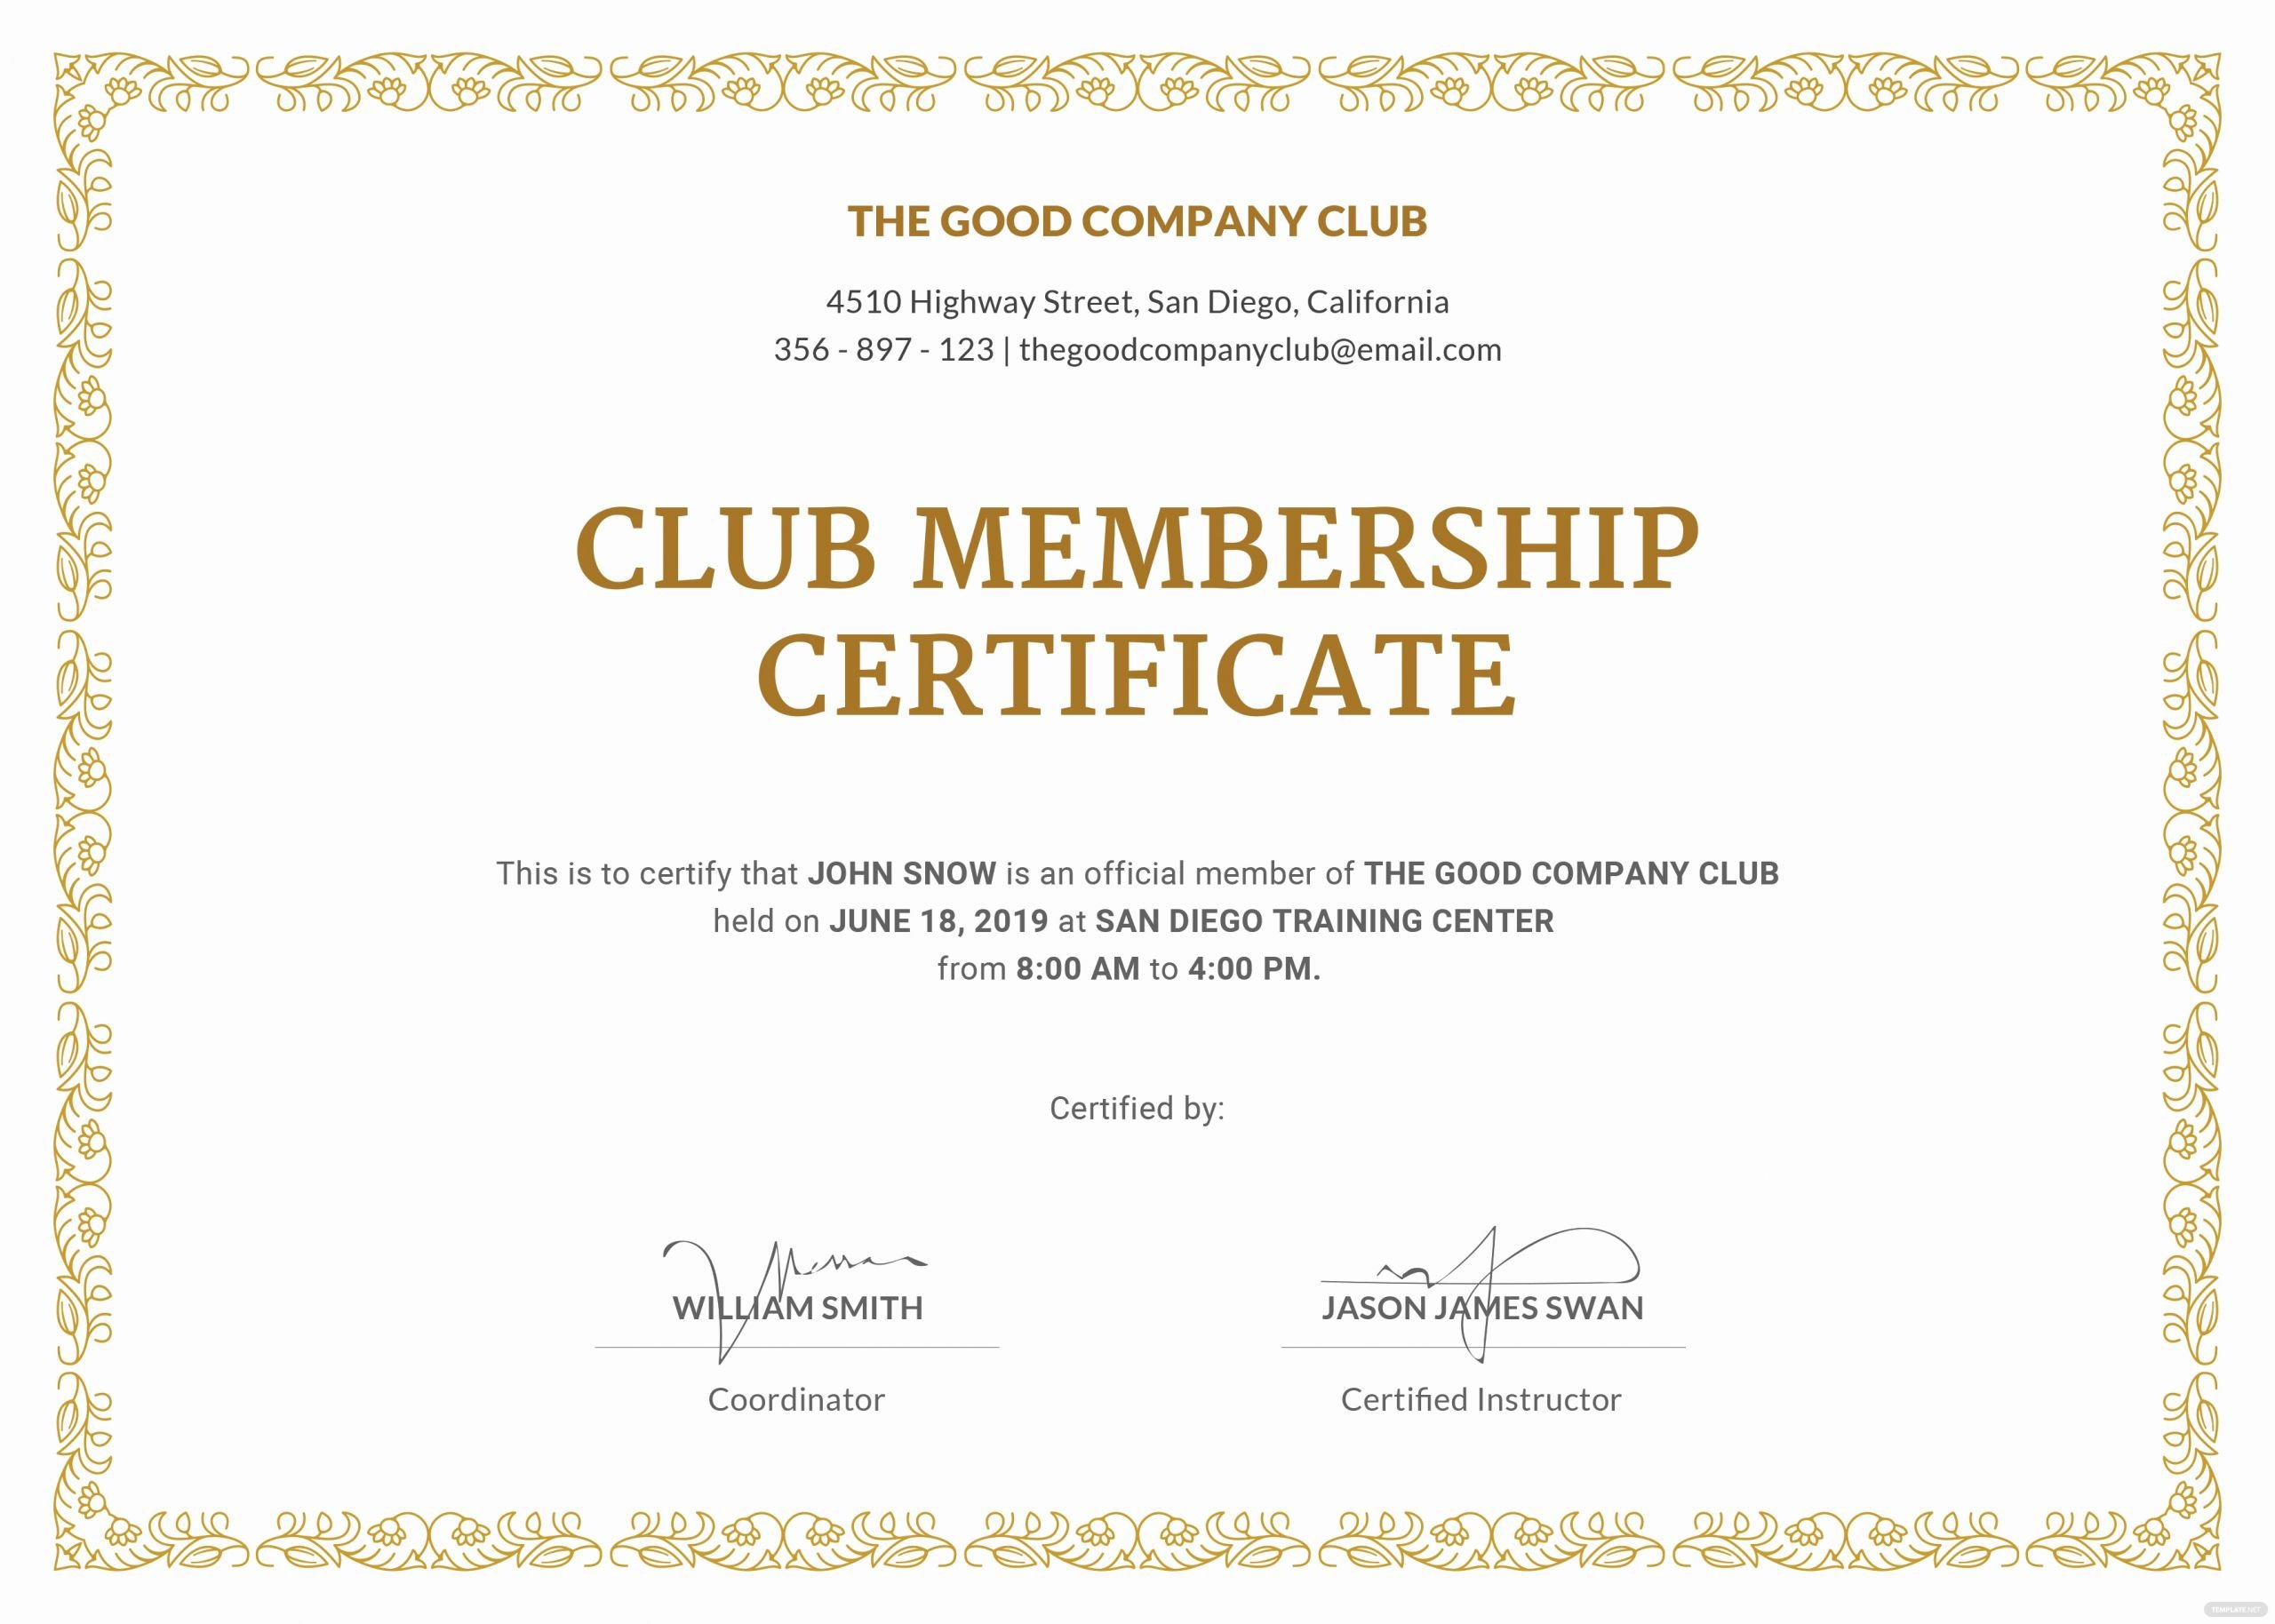 Rotary Certificate Of Appreciation Template Best Of Free Club Membership Certificate Template In Adobe